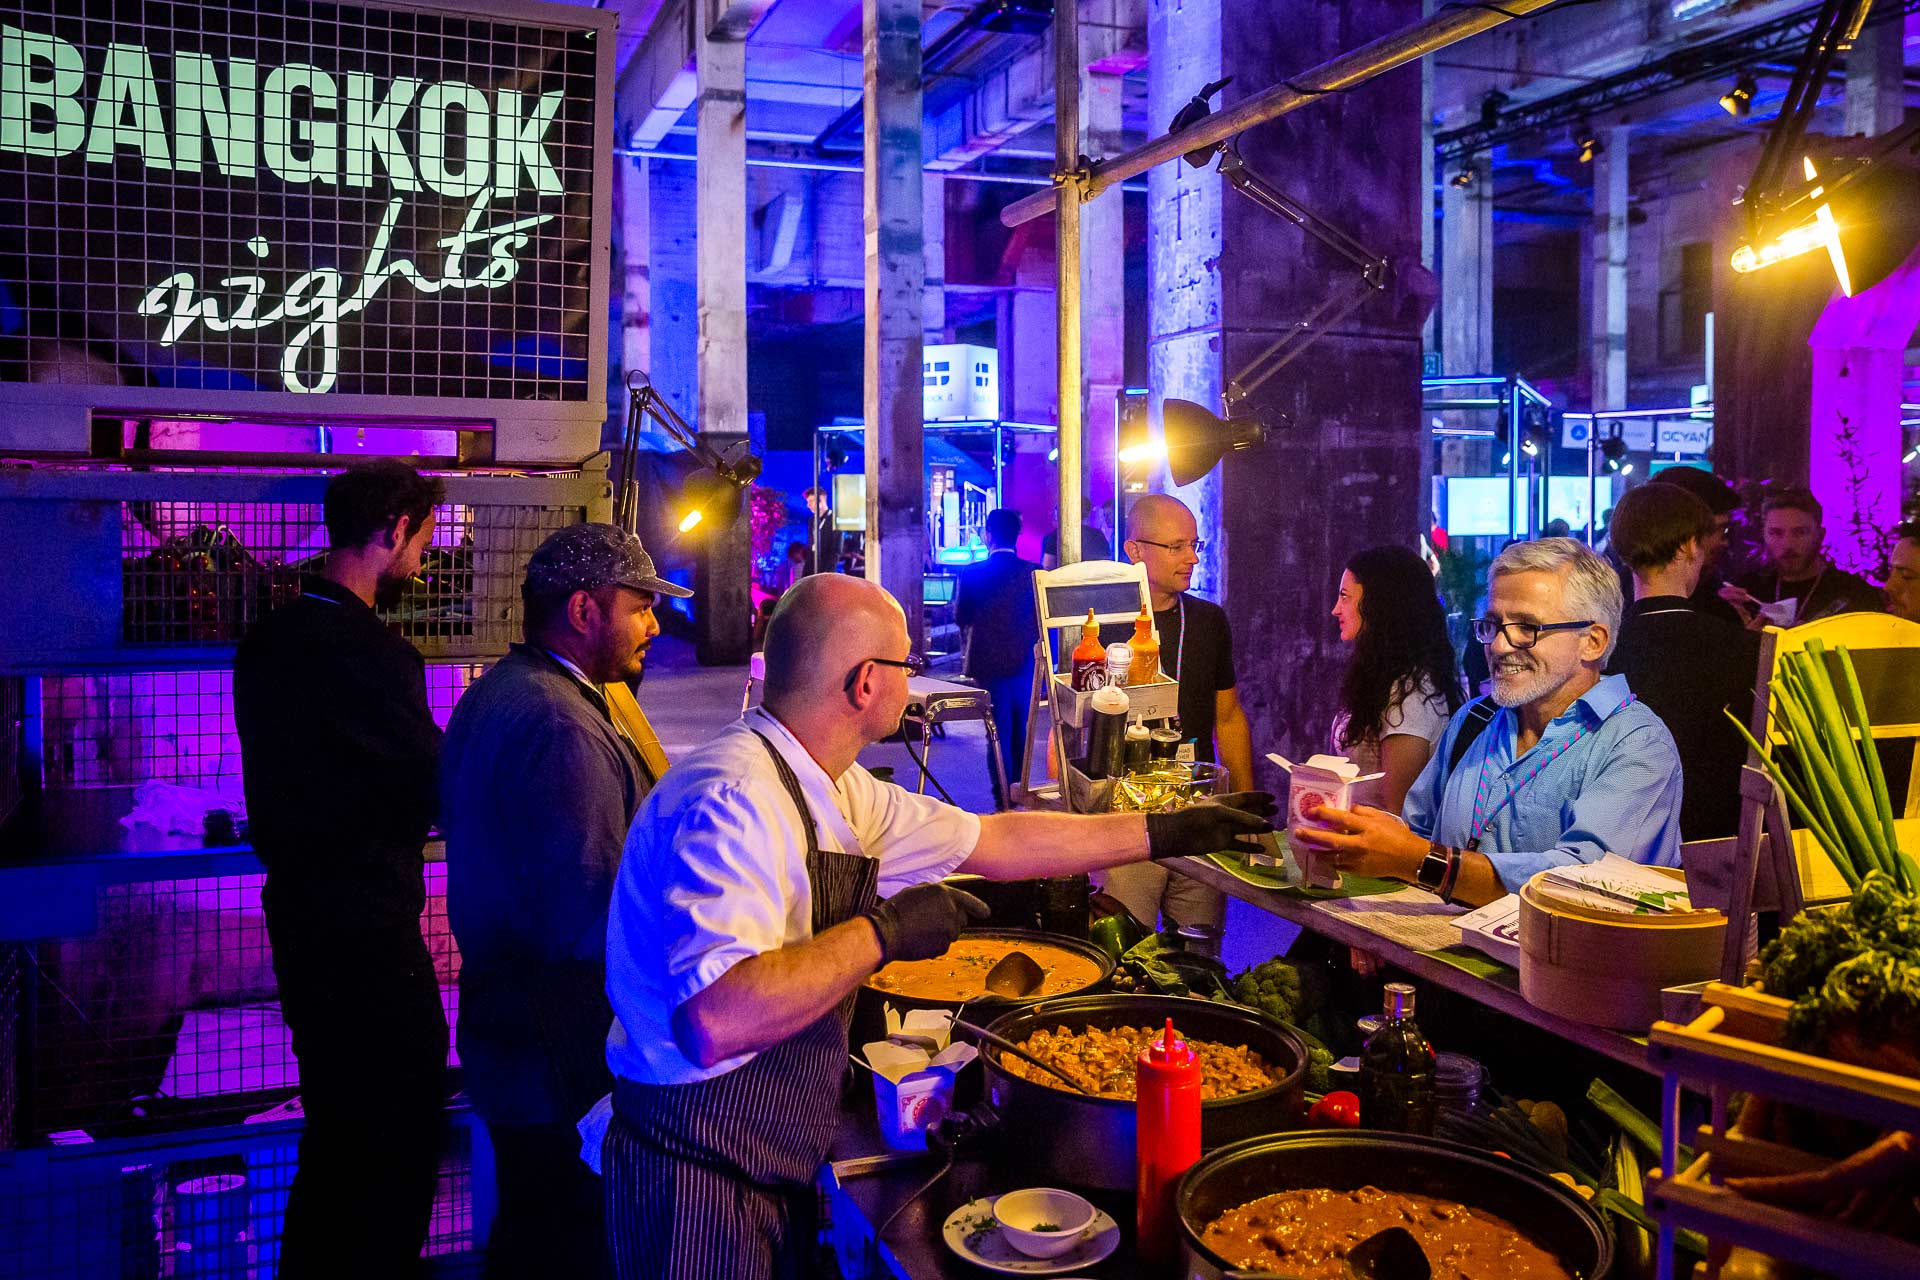 fotograf-veranstaltung-food-cateringagentur-kraftwerk-berlin